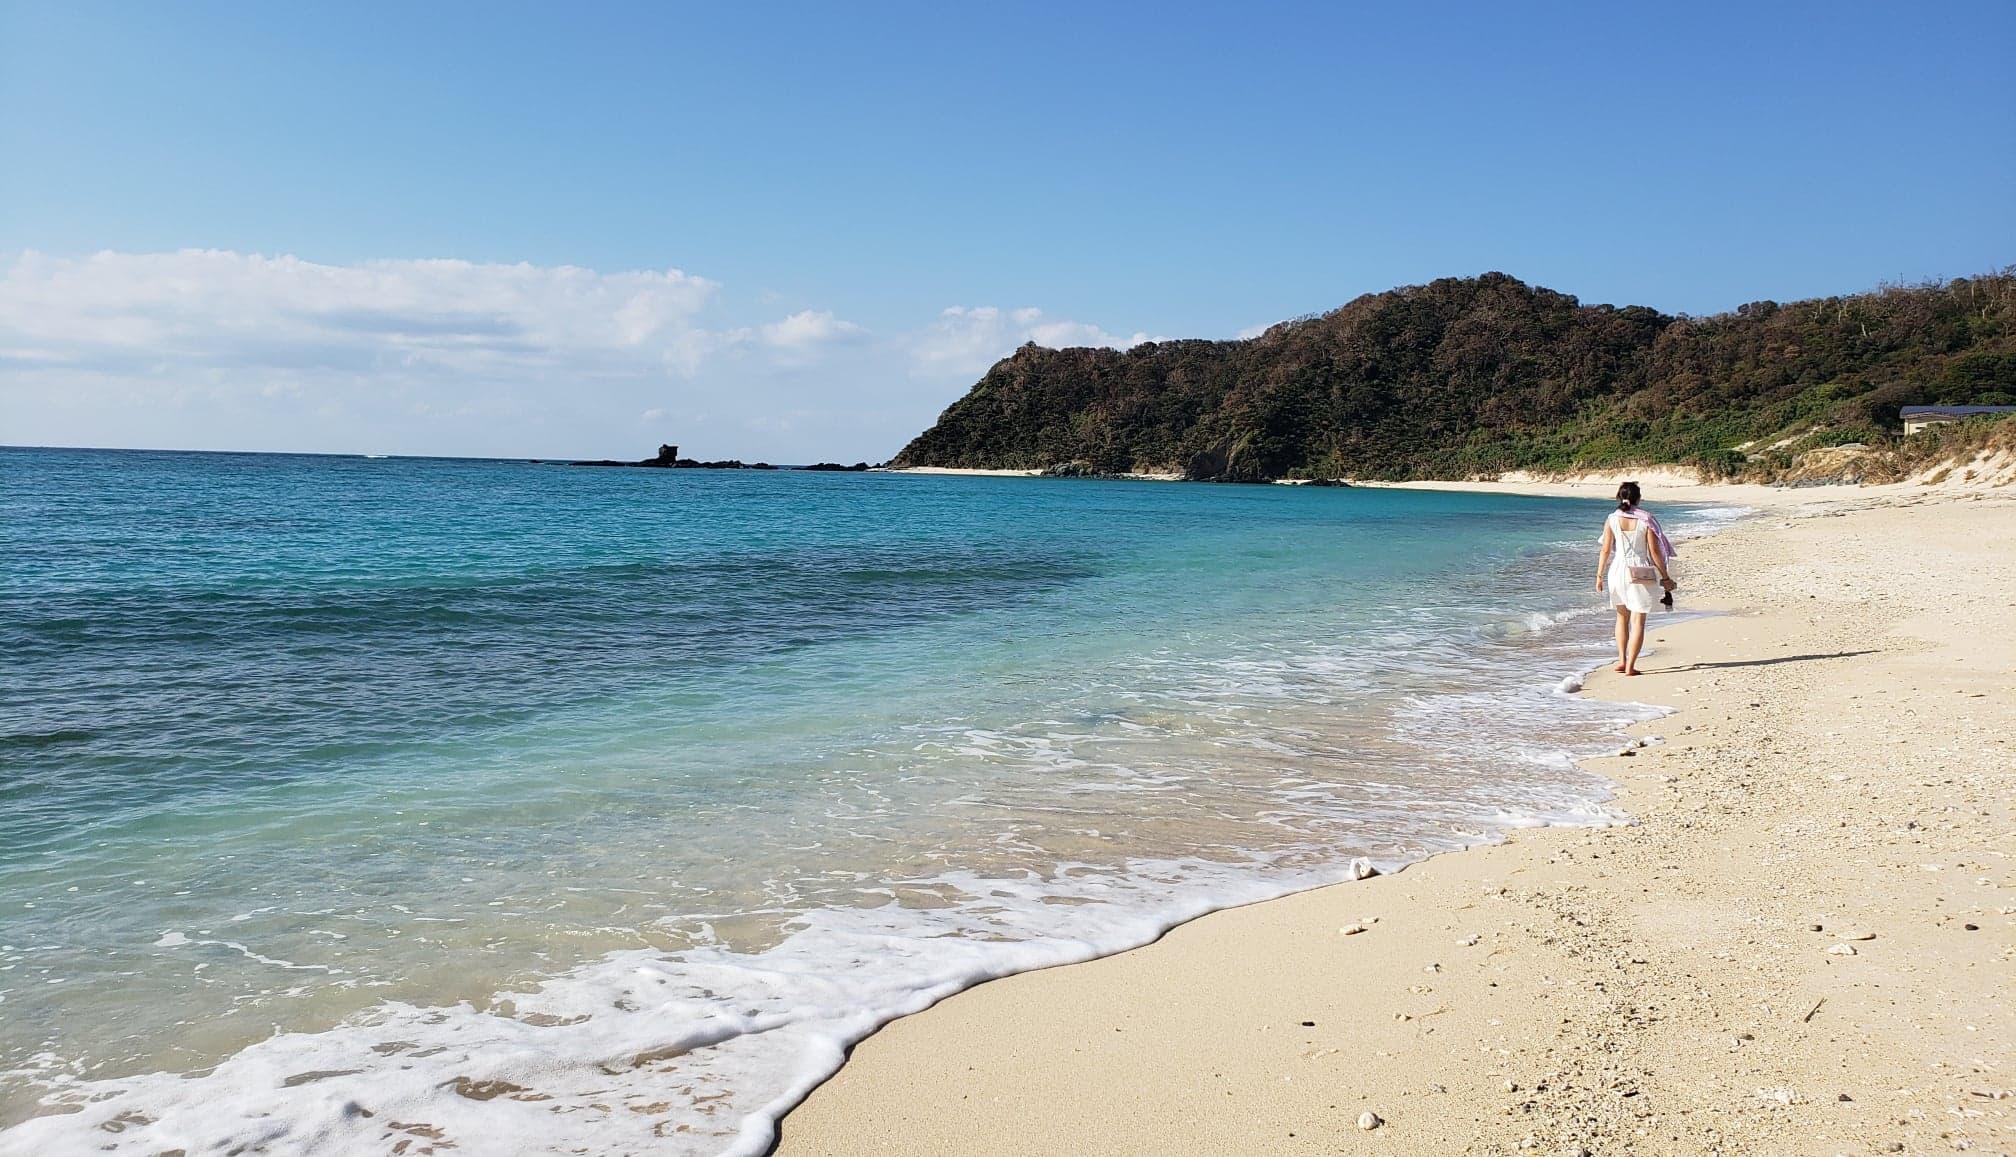 Sakibaru Beach, Amami Oshima